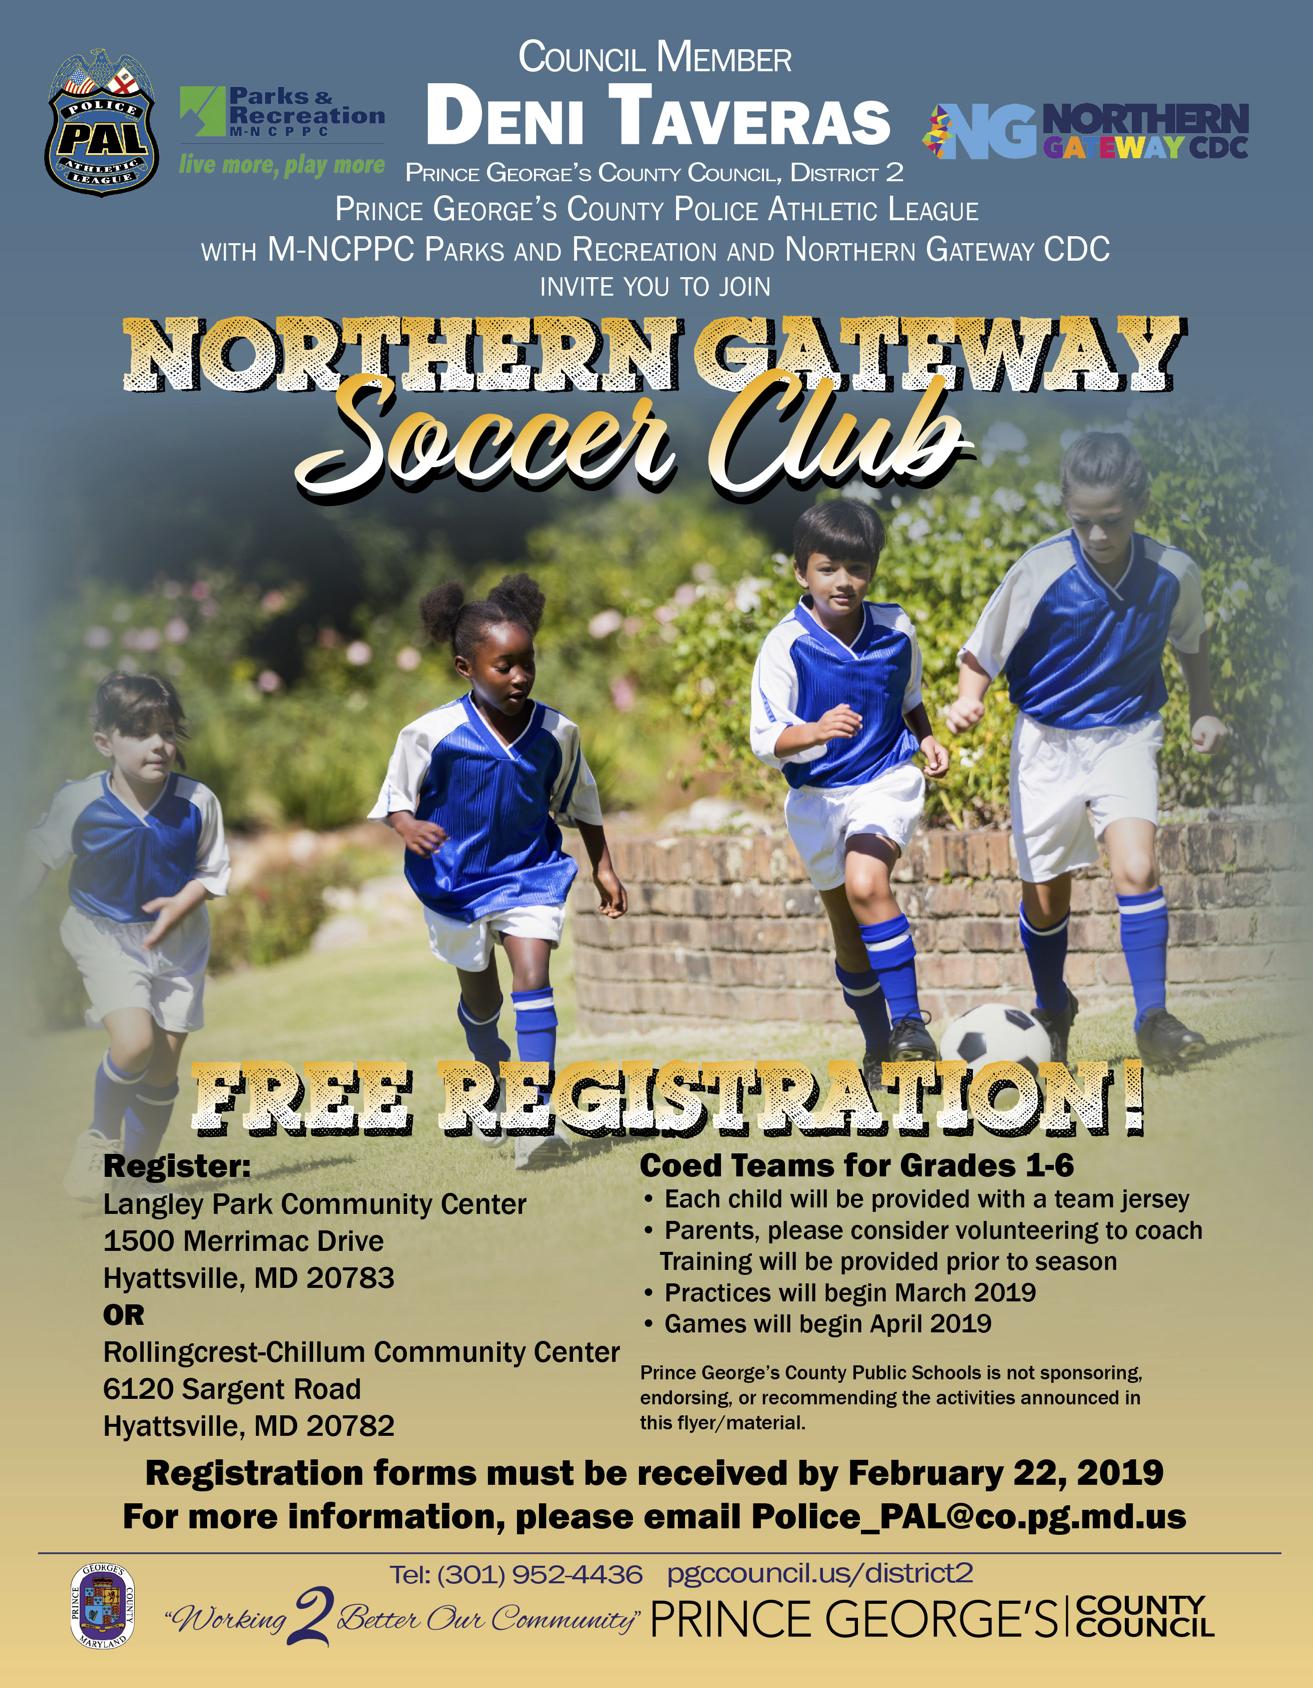 NorthernGateway.PAL.SoccerClub.2019.png